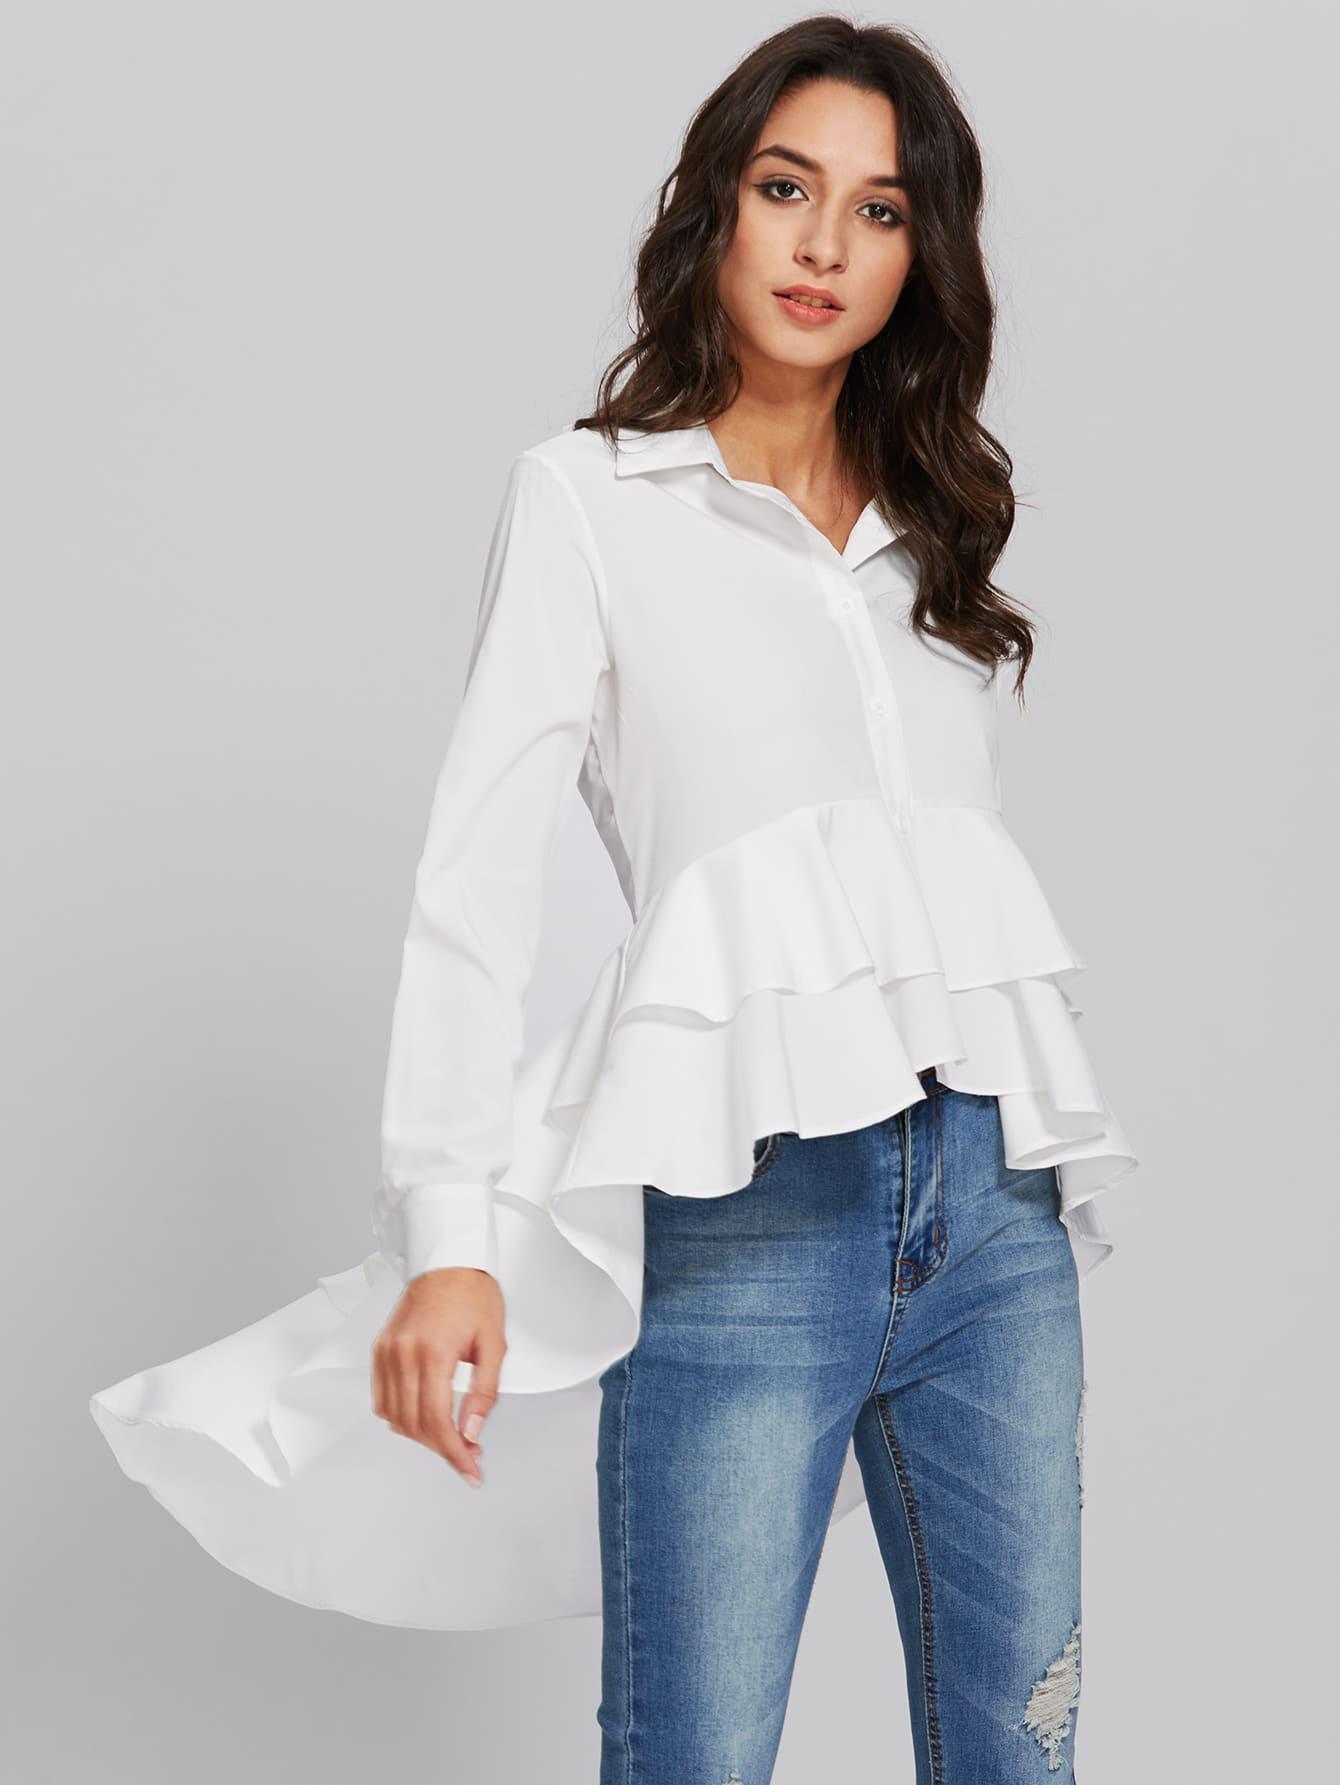 Dip Hem Frill Layered Shirt black one shoulder frill layered design jumpsuit